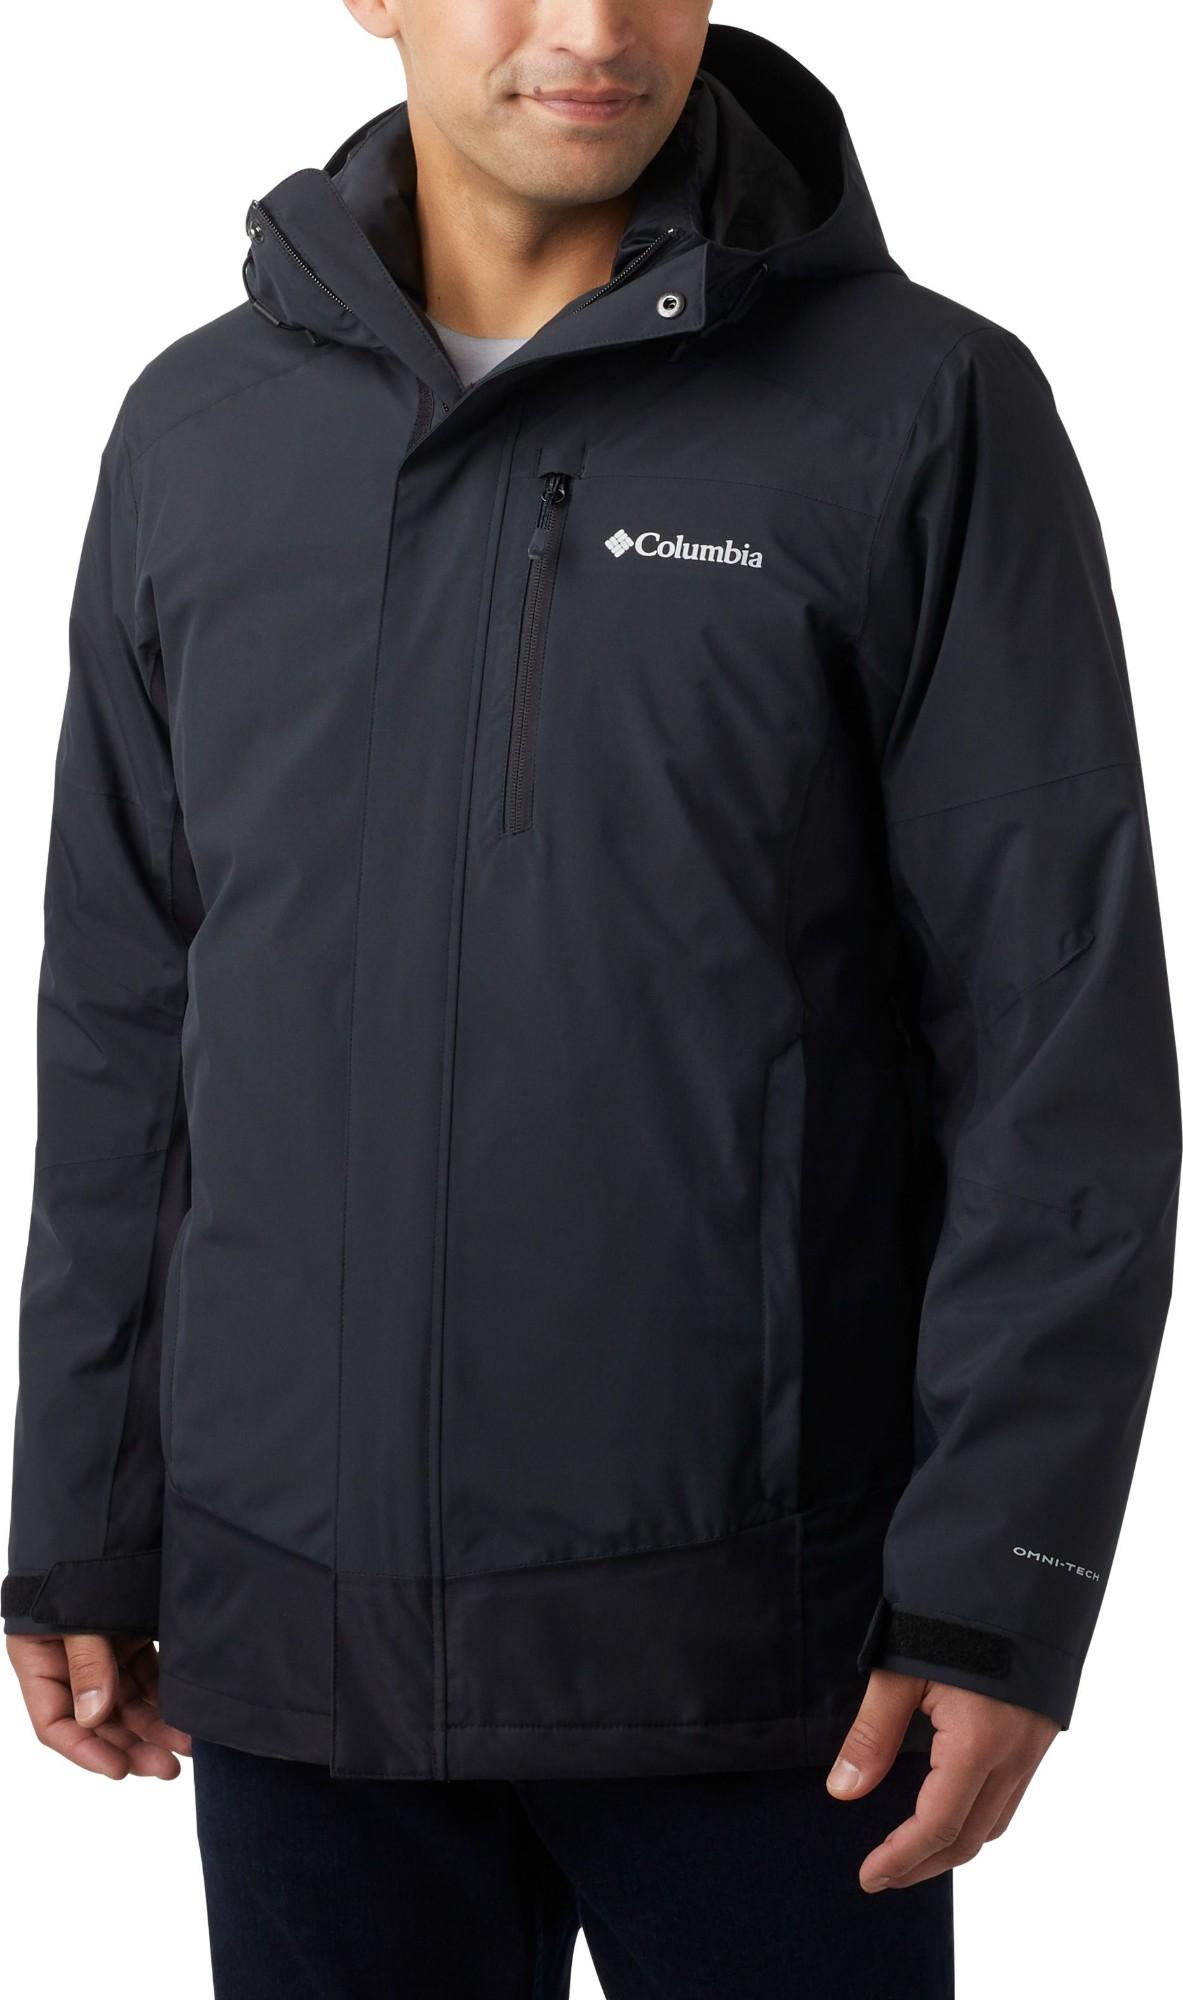 Columbia Lhotse III Interchange Jacket Men's Black L